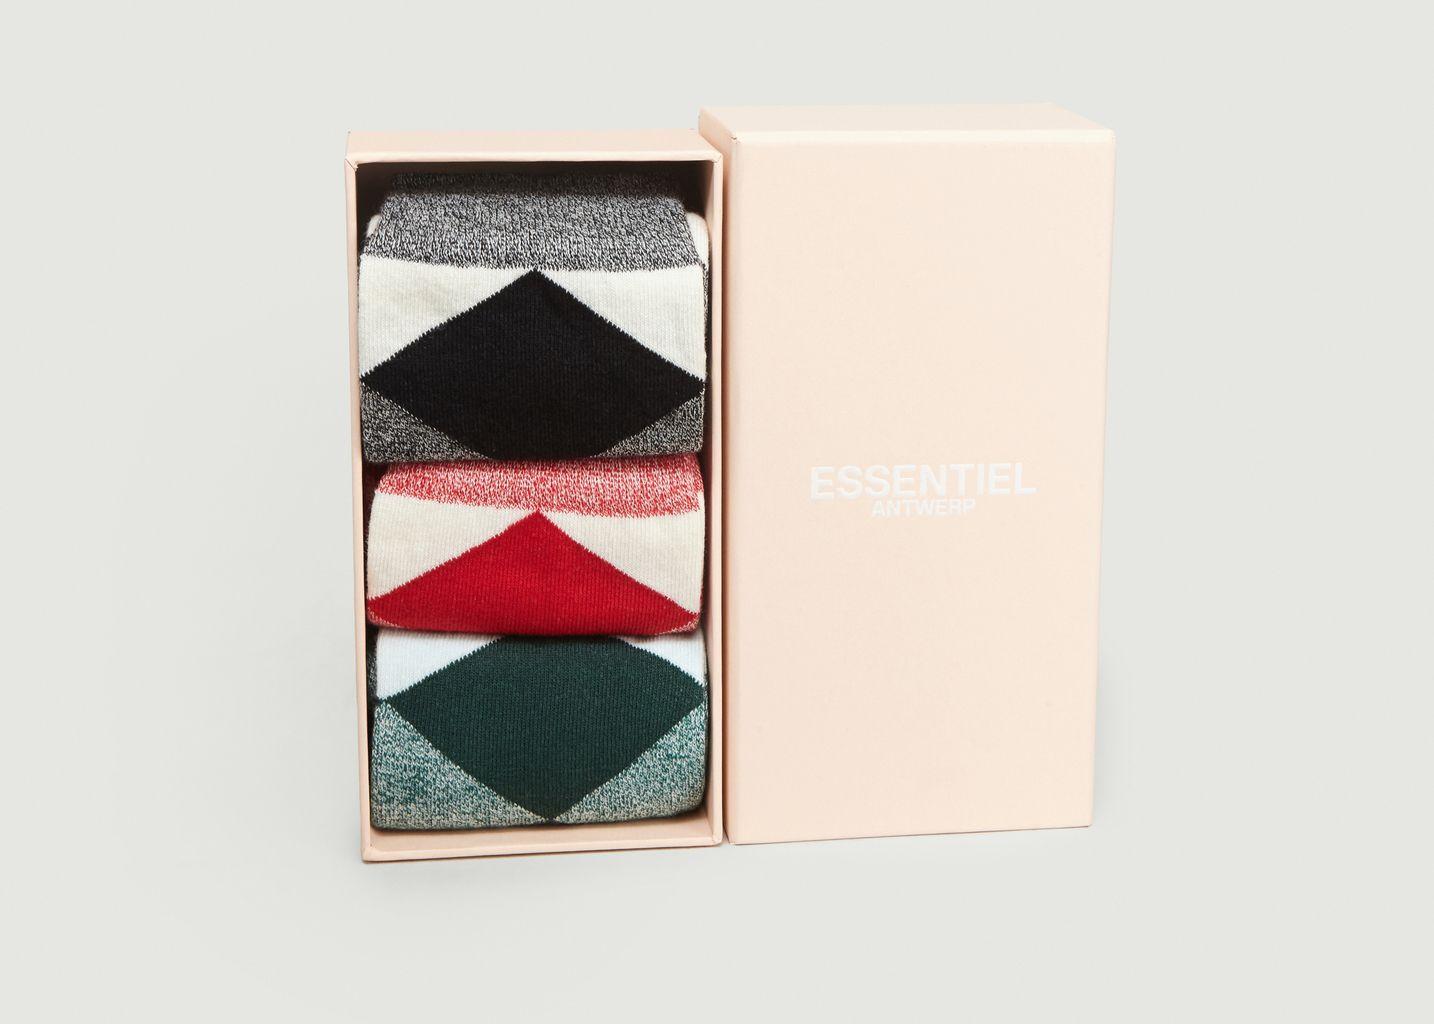 Lot de 3 Chaussettes Reggie - Essentiel Antwerp